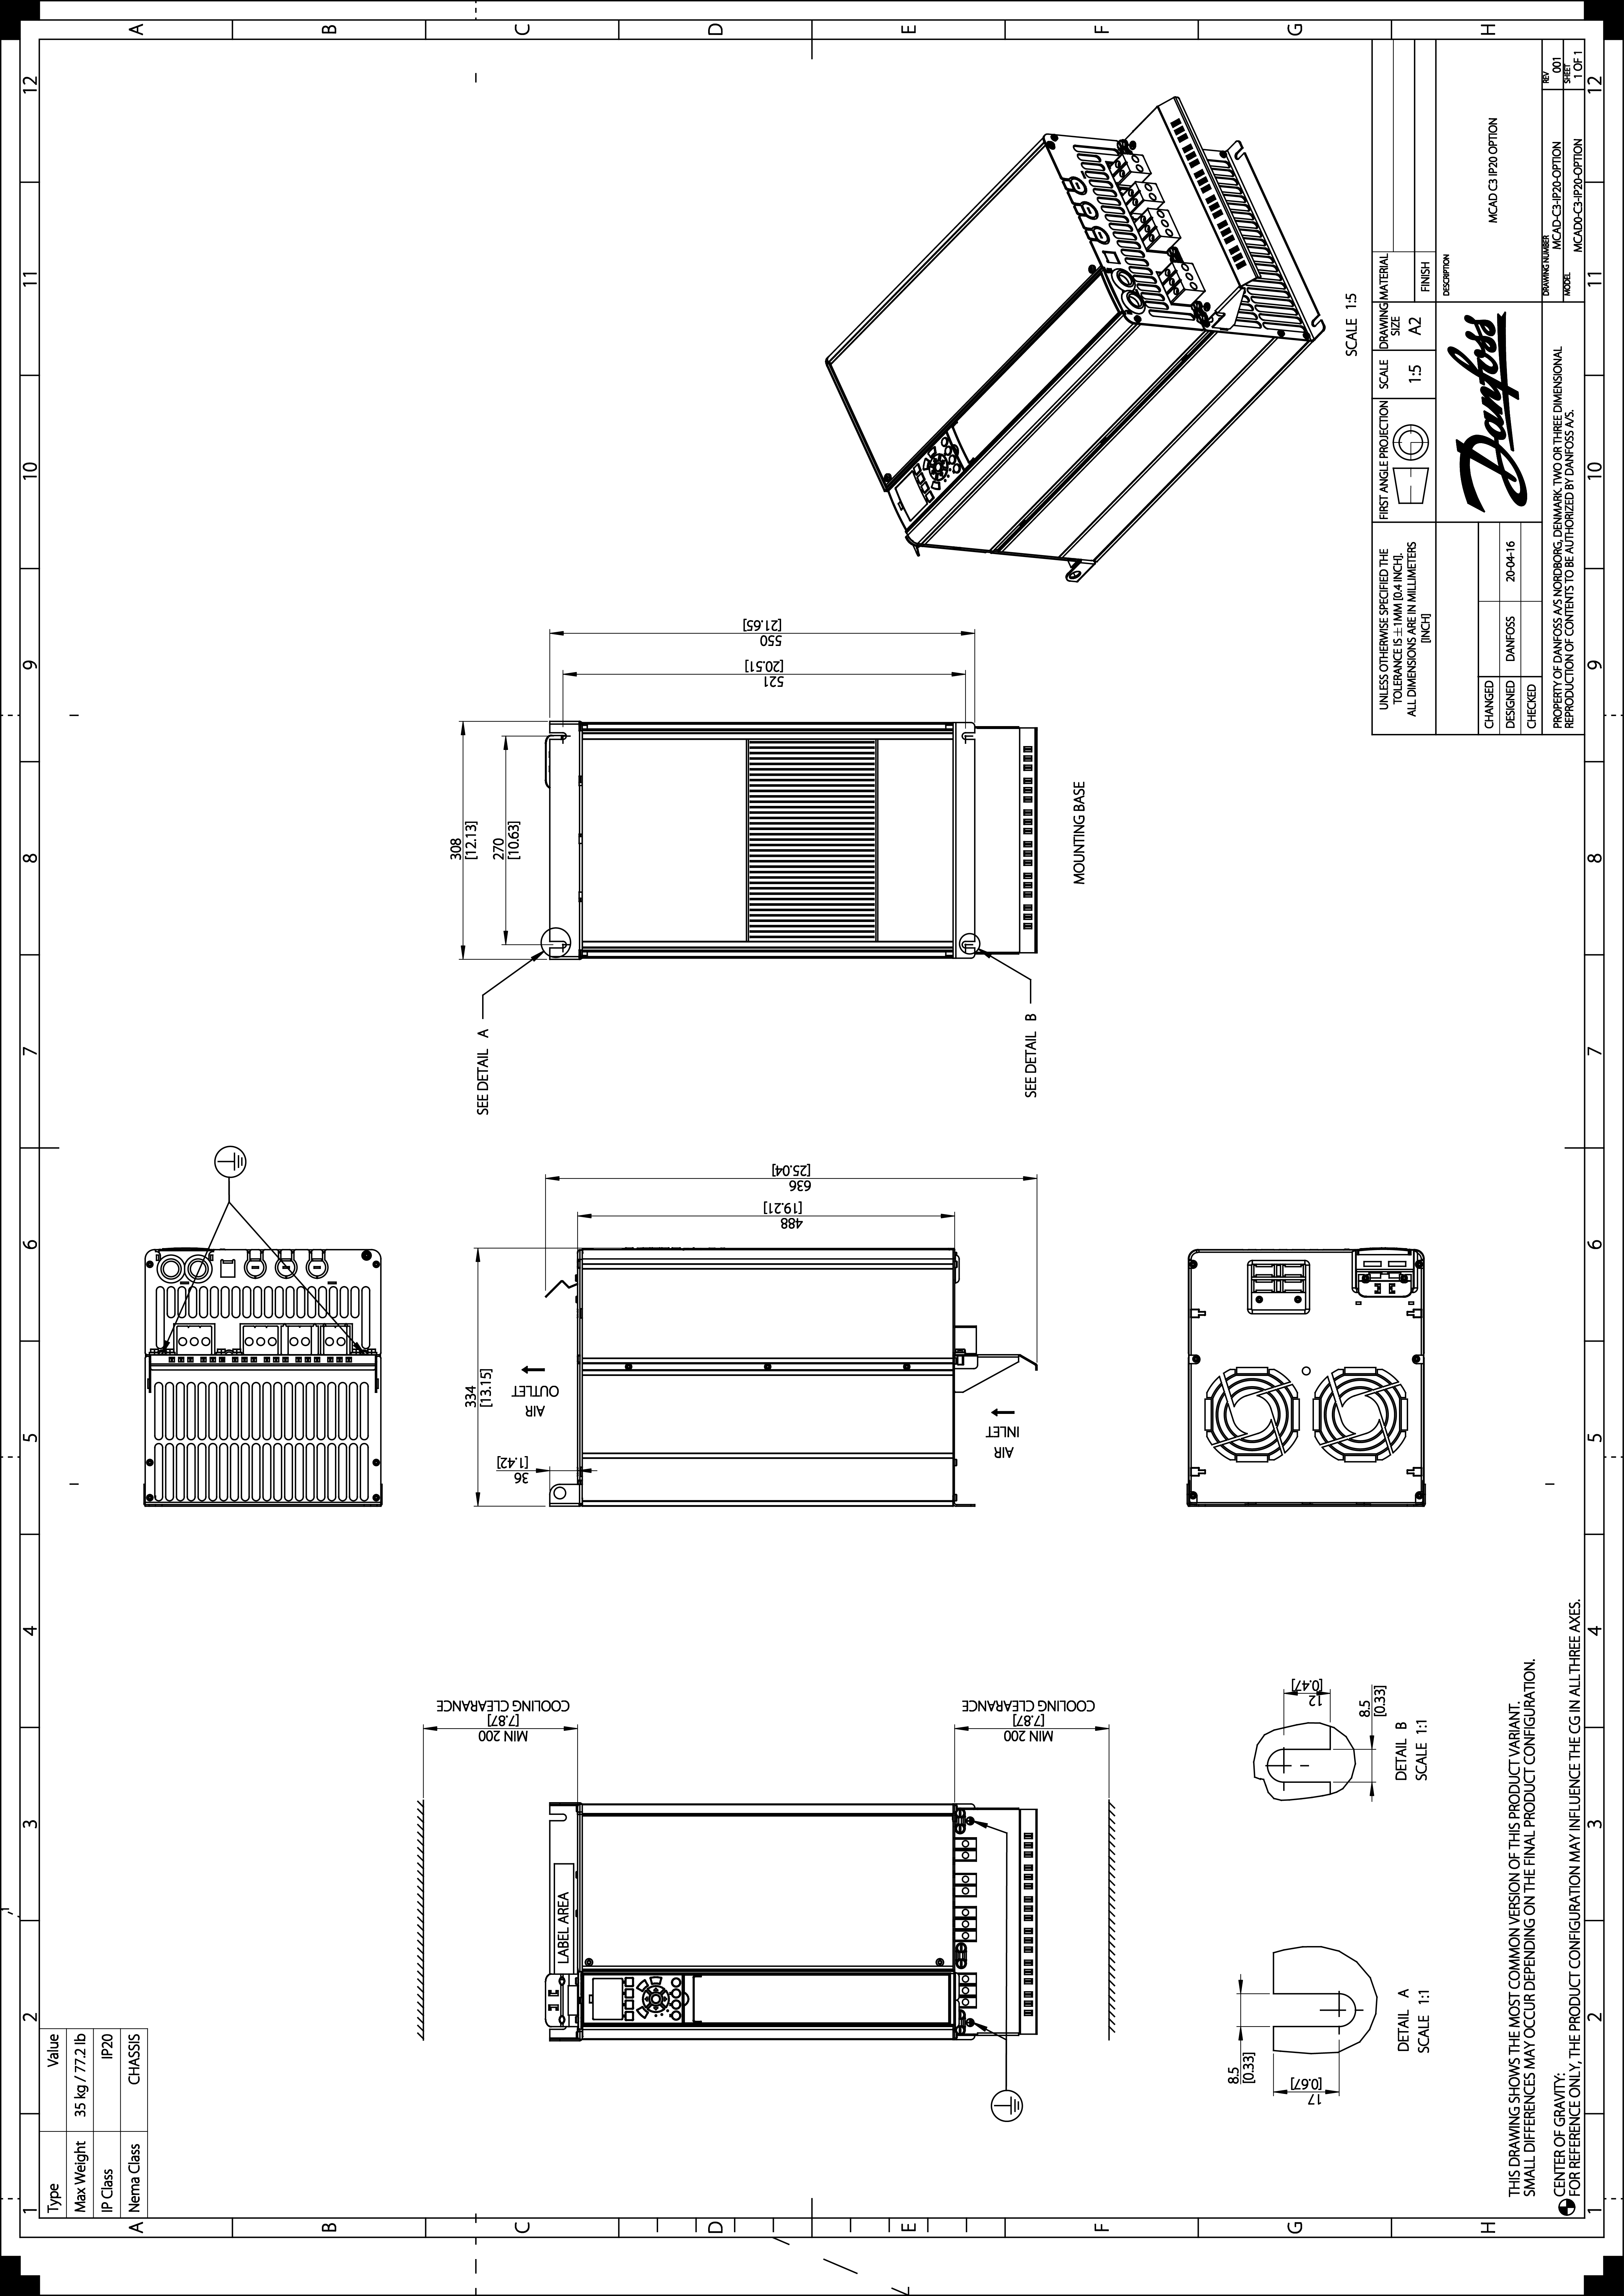 Enhanced Vlt Hvac Drive Fc 102 Danfoss Drawing Notes 27 Mb